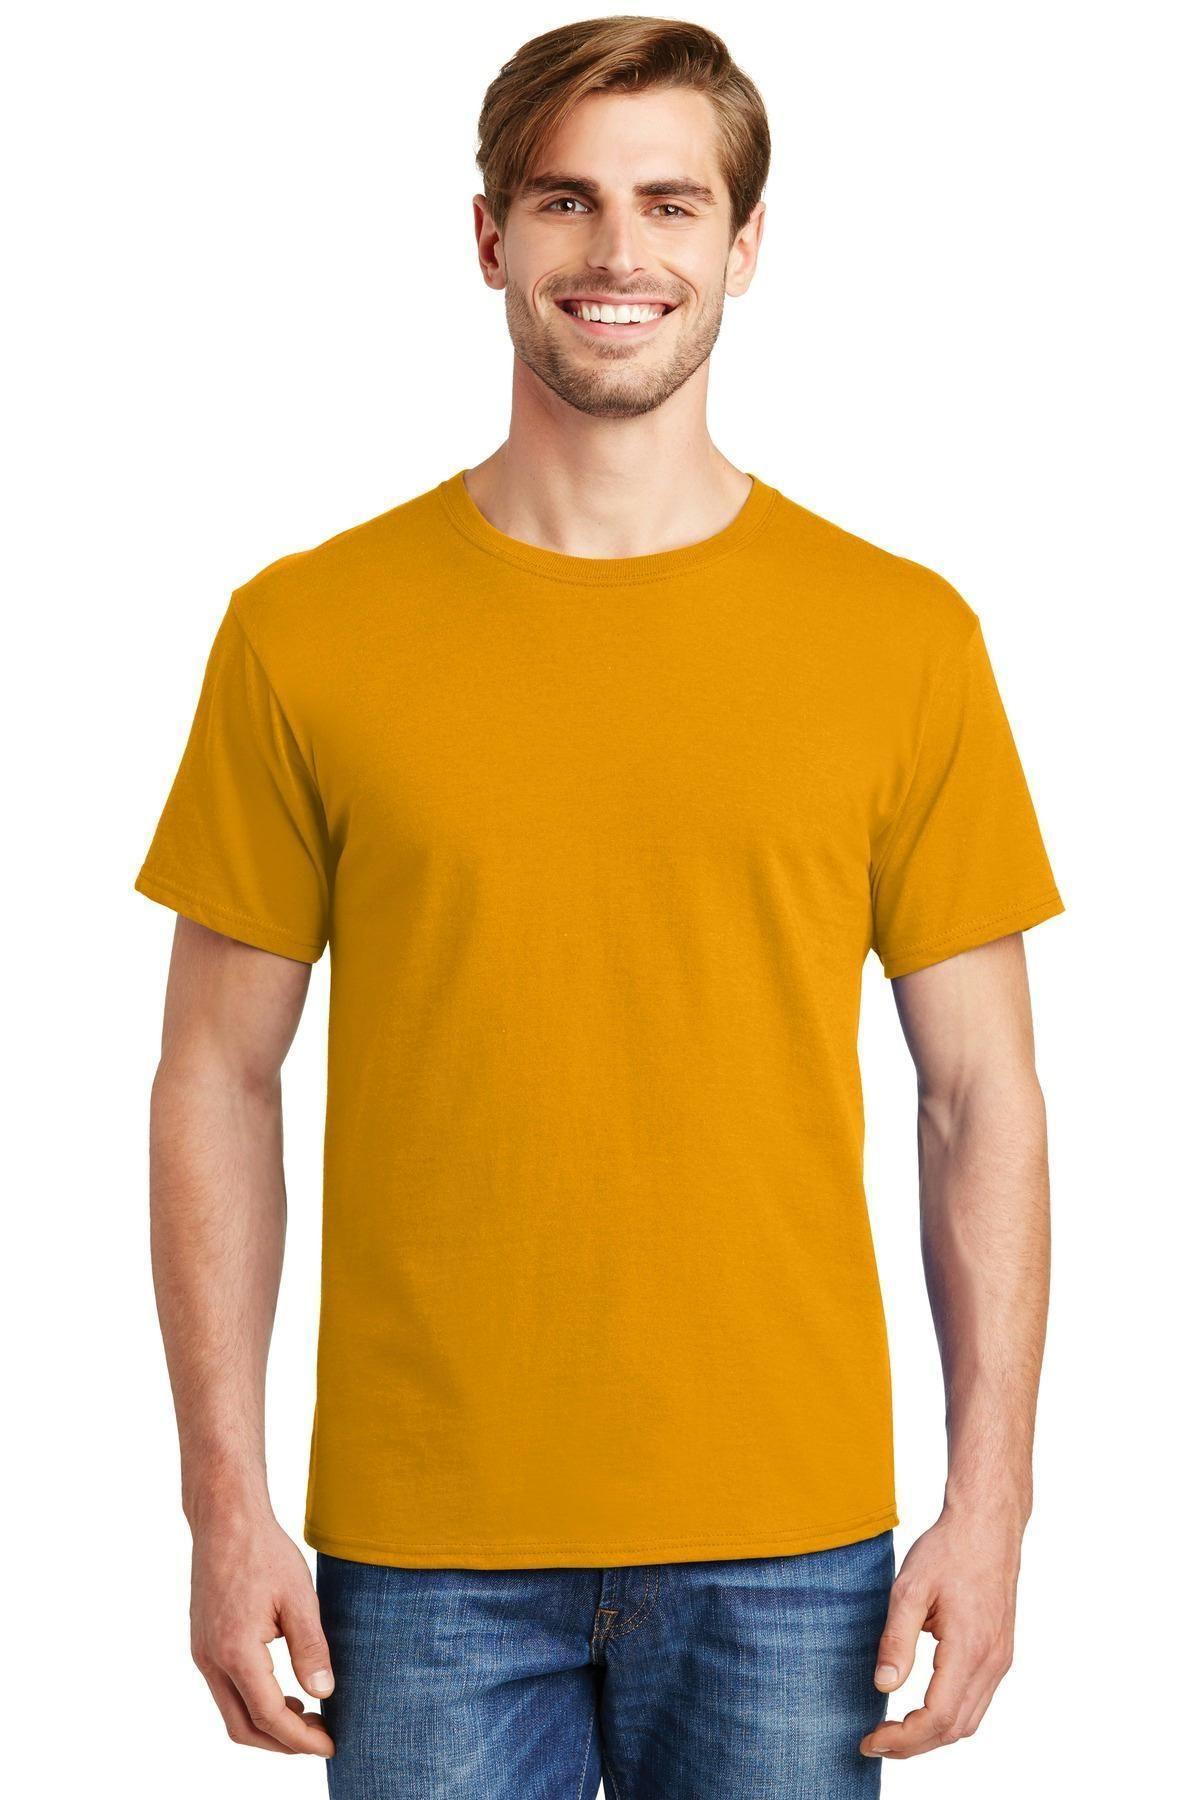 c08e6ea6 Hanes - ComfortSoft 100% Cotton T-Shirt. 5280   Products   Shirts, T ...